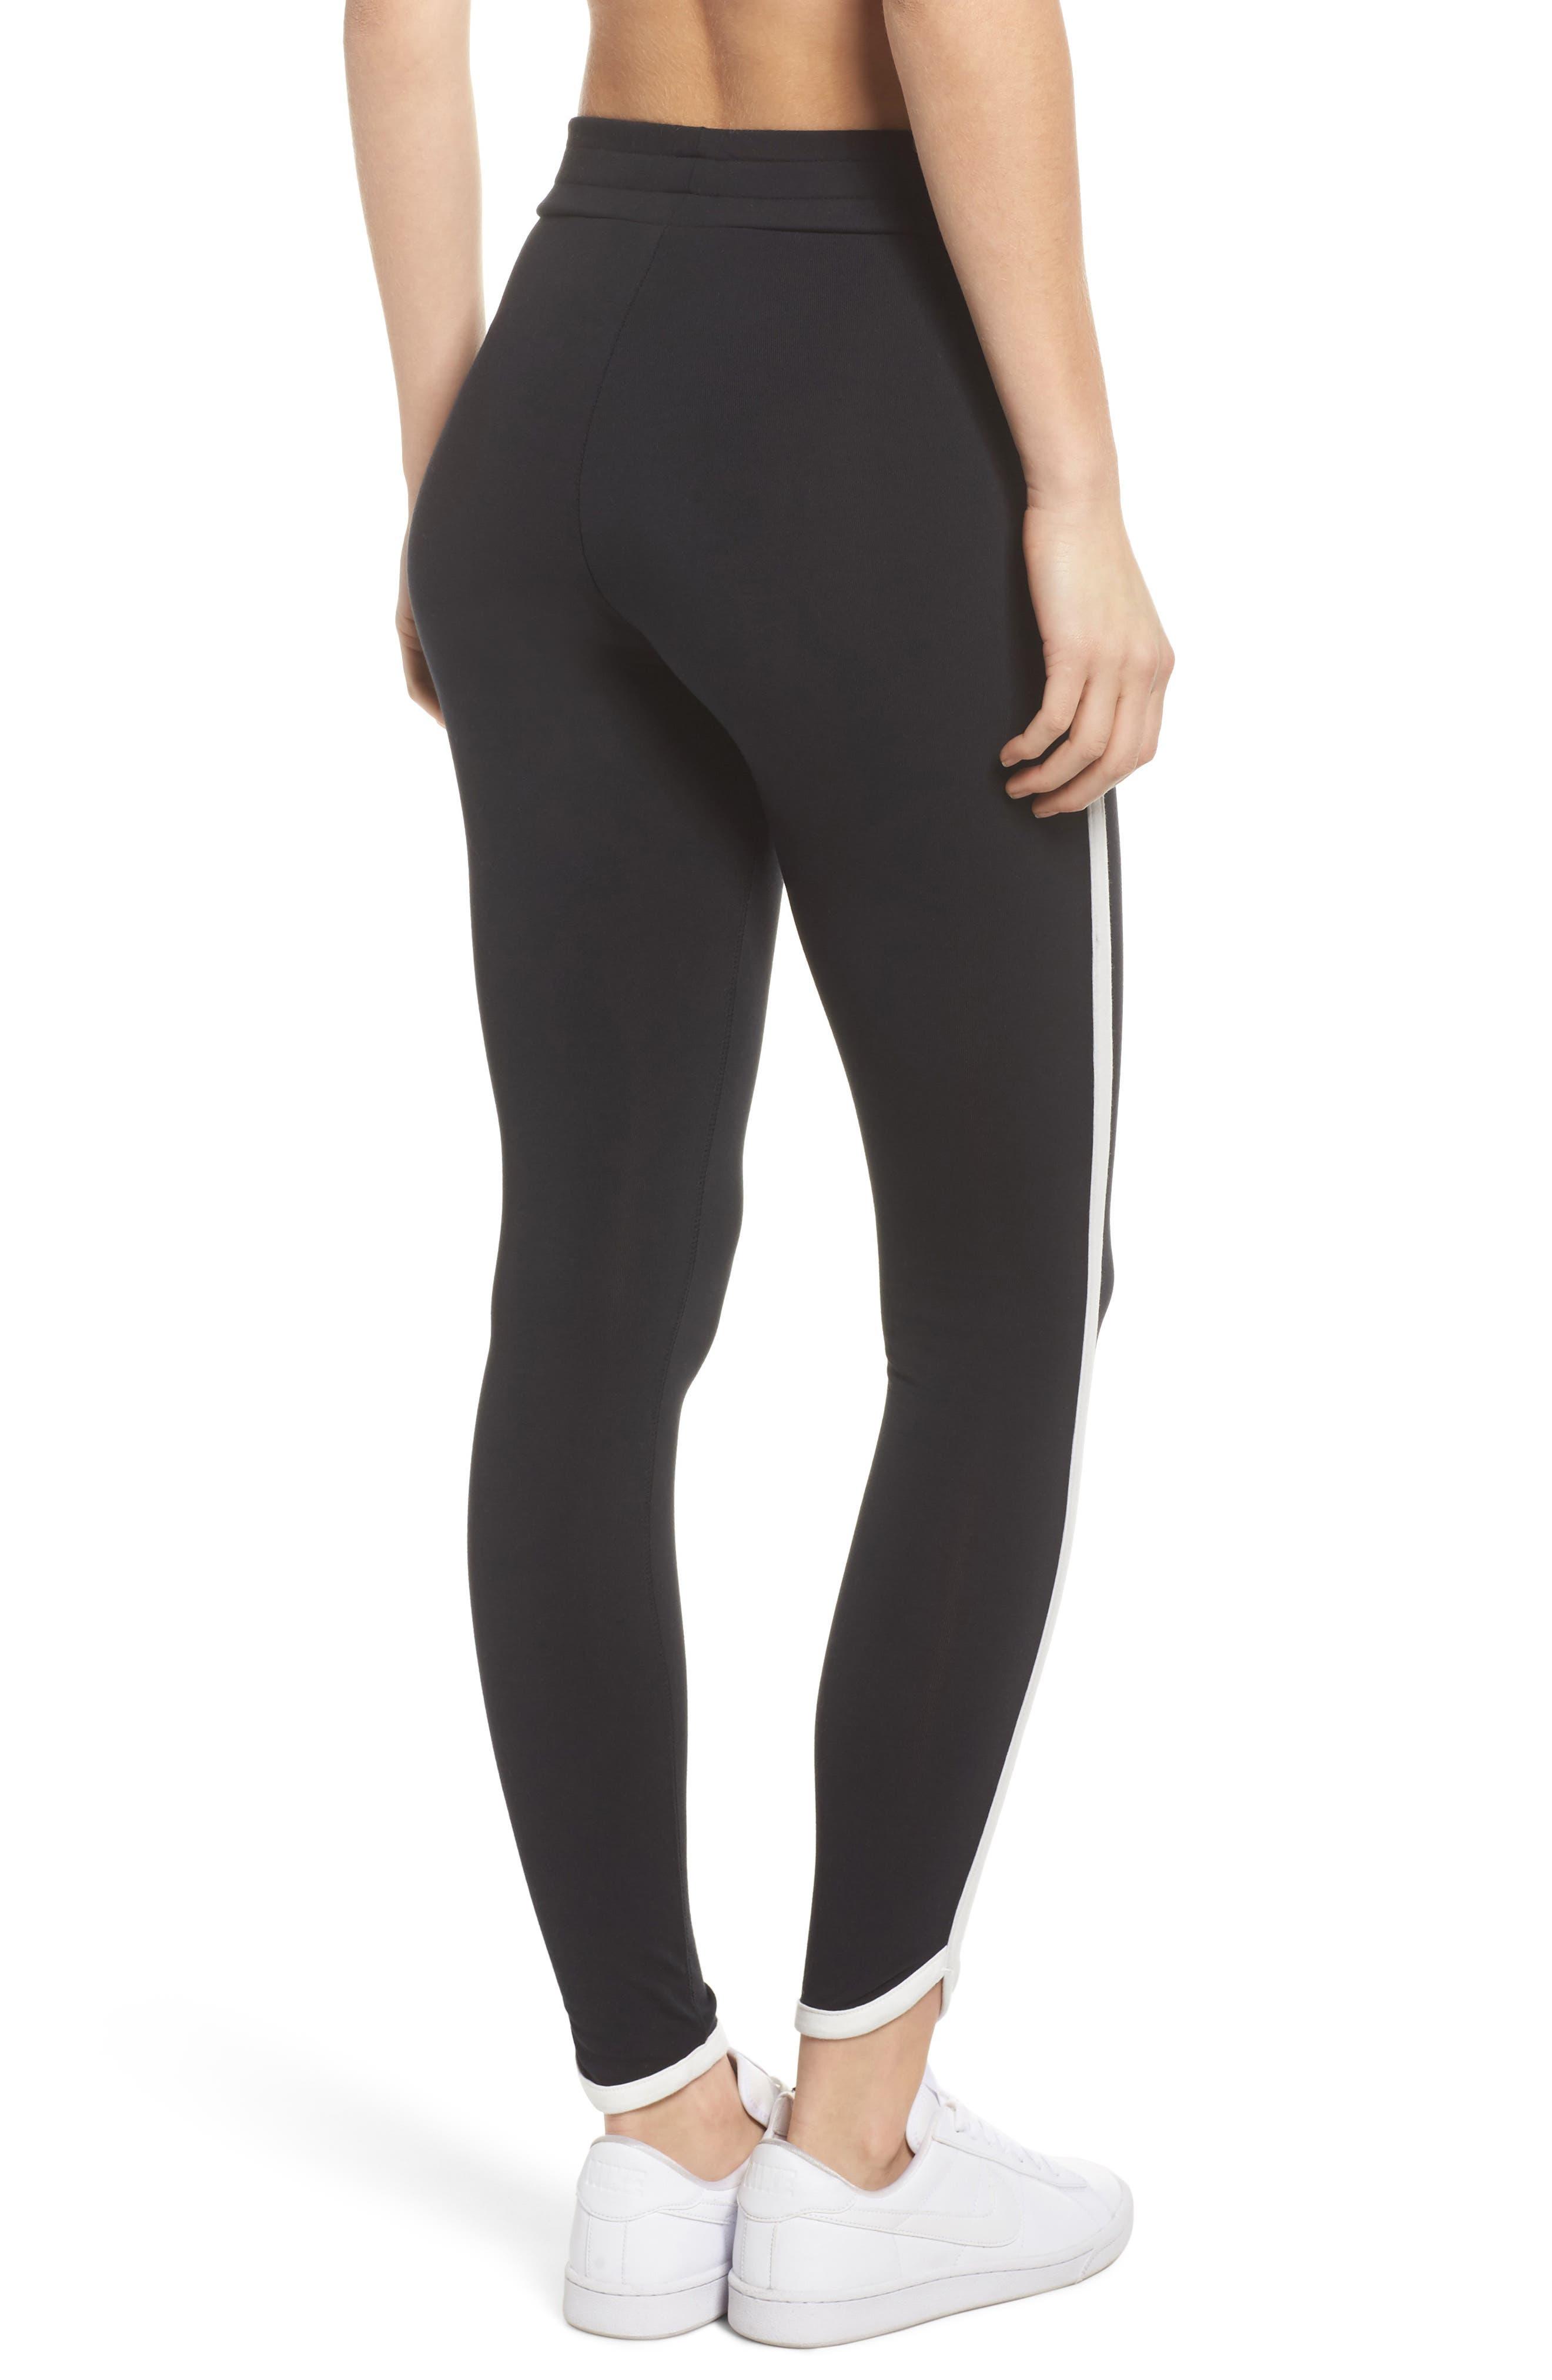 Sportswear Women's Leggings,                             Alternate thumbnail 2, color,                             Black/ Sail